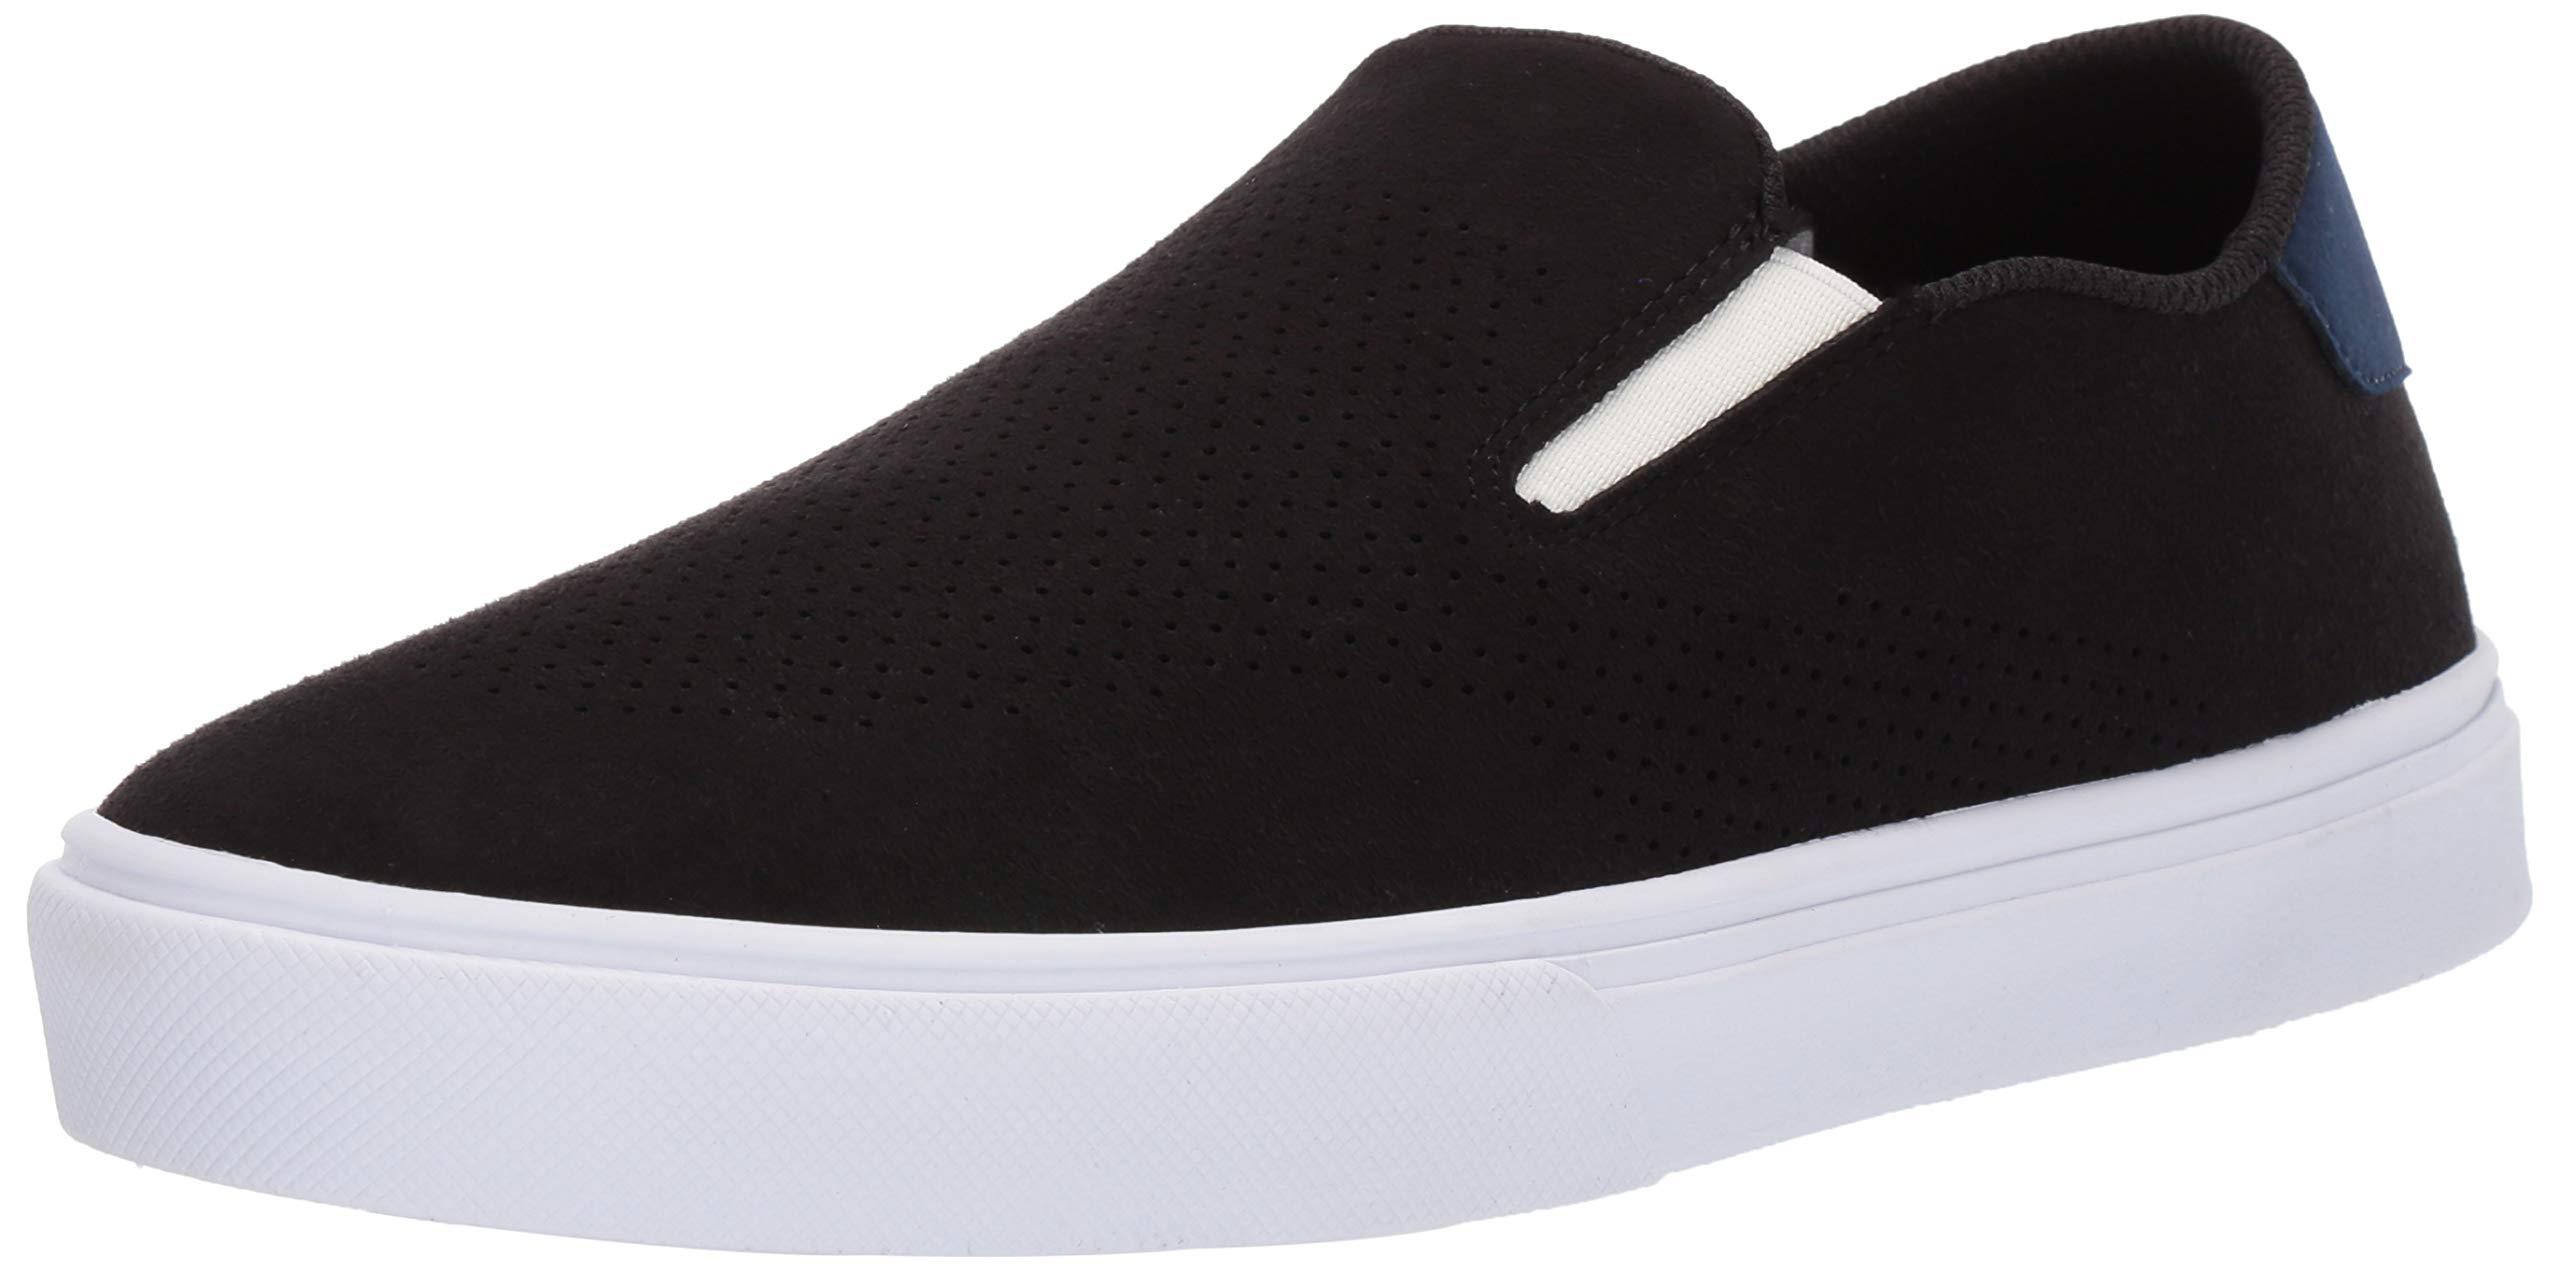 Etnies Men's Cirrus Lightweight Slip-On Sneaker